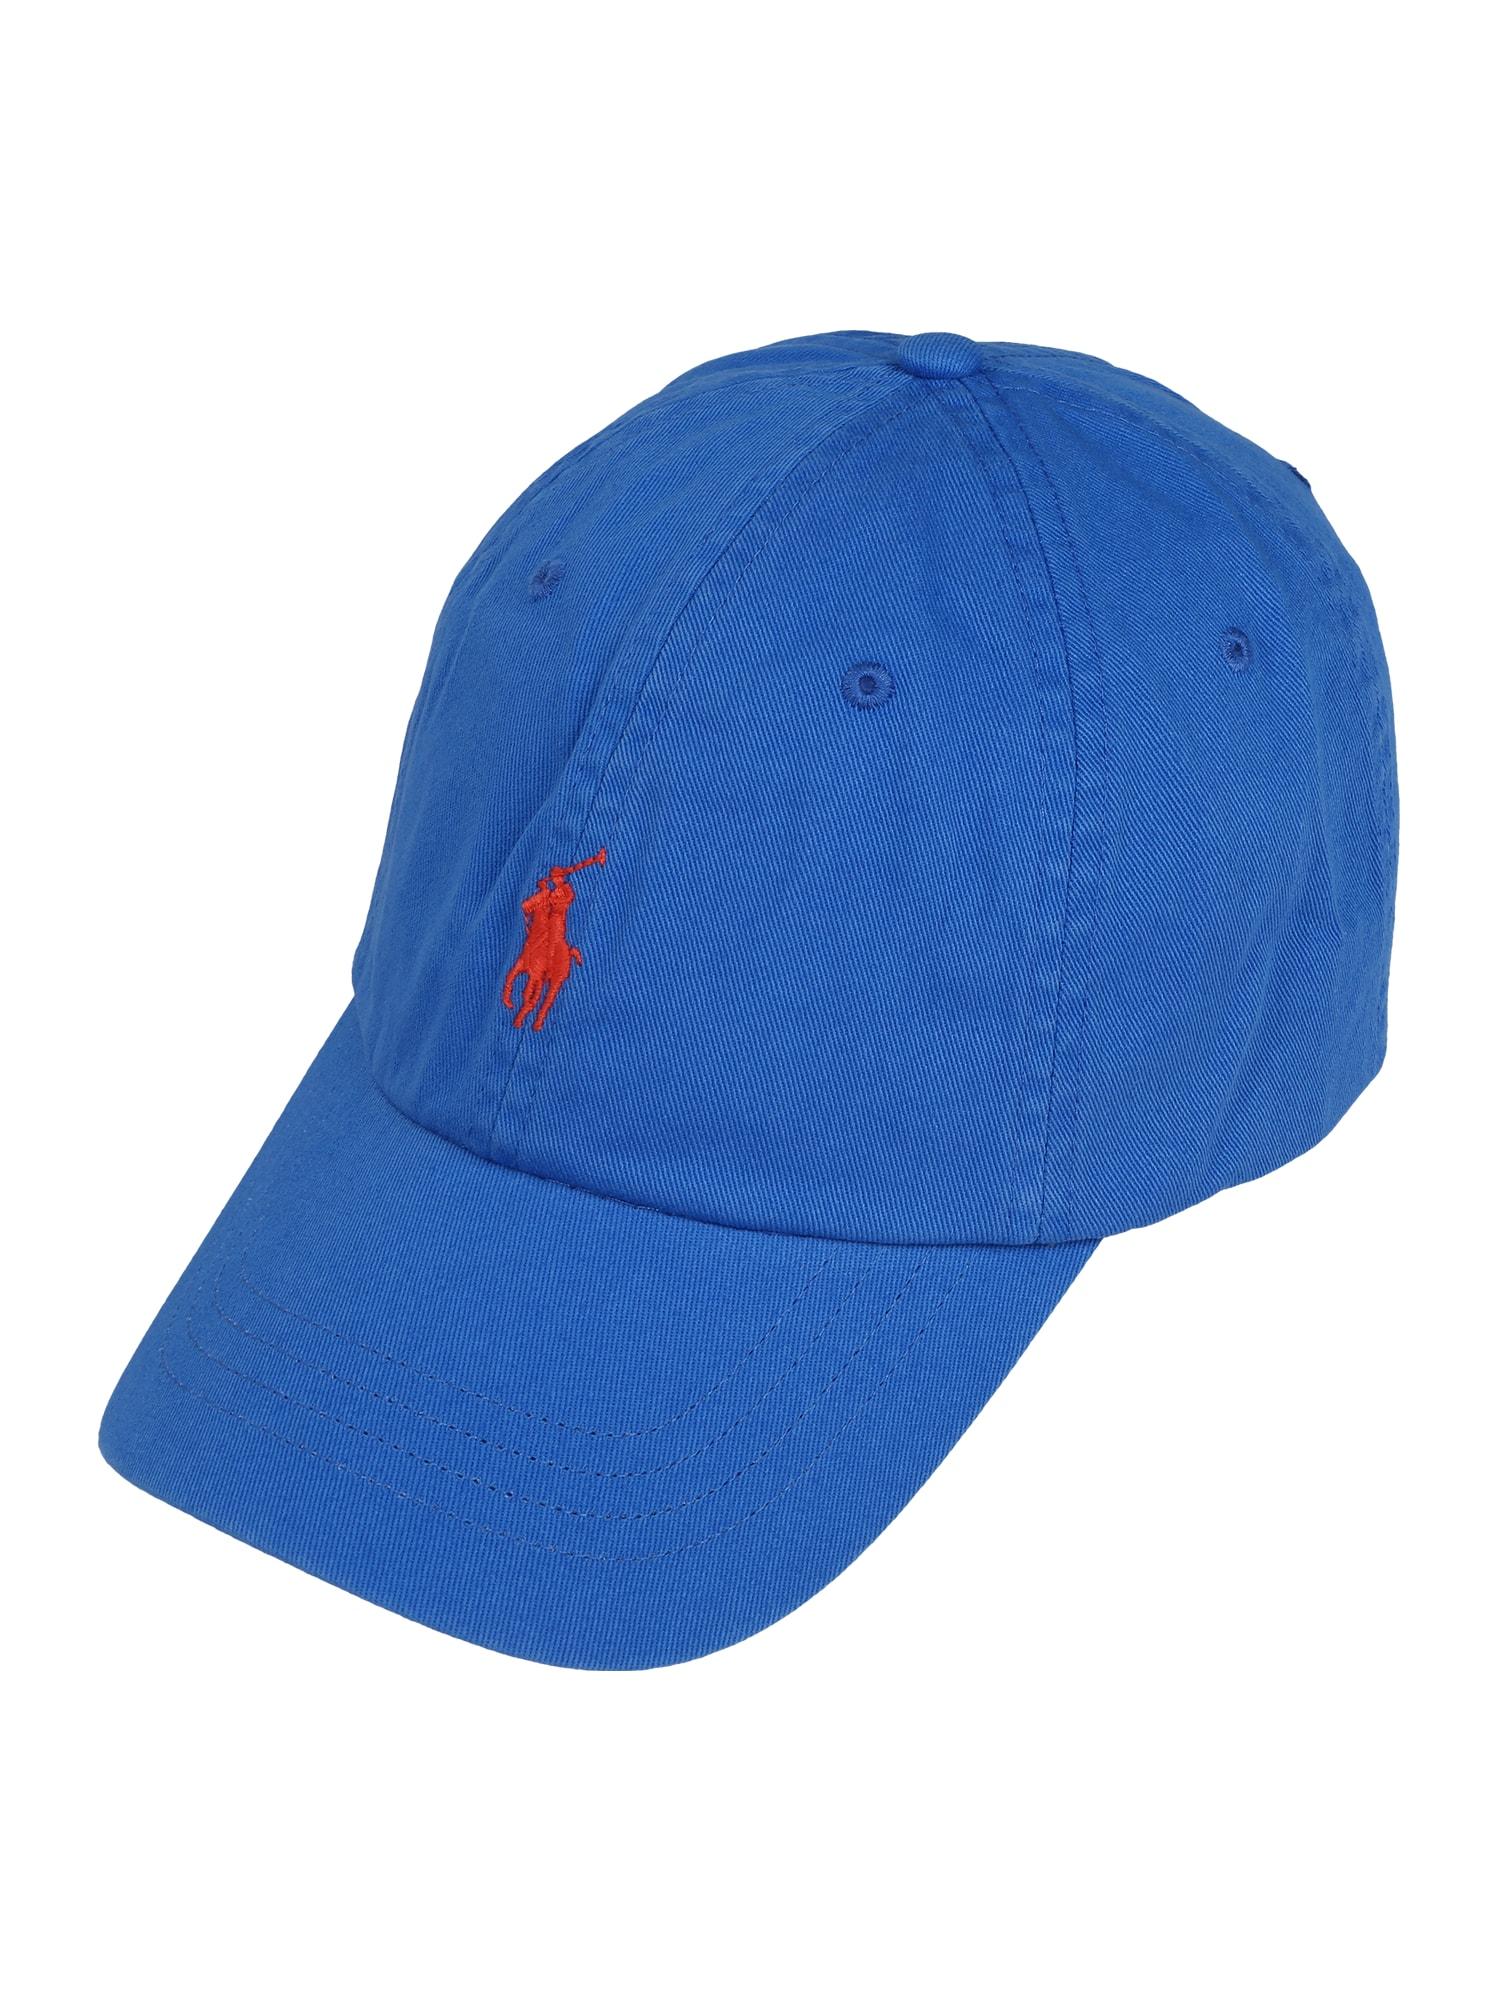 POLO RALPH LAUREN Kepurė mėlyna / raudona